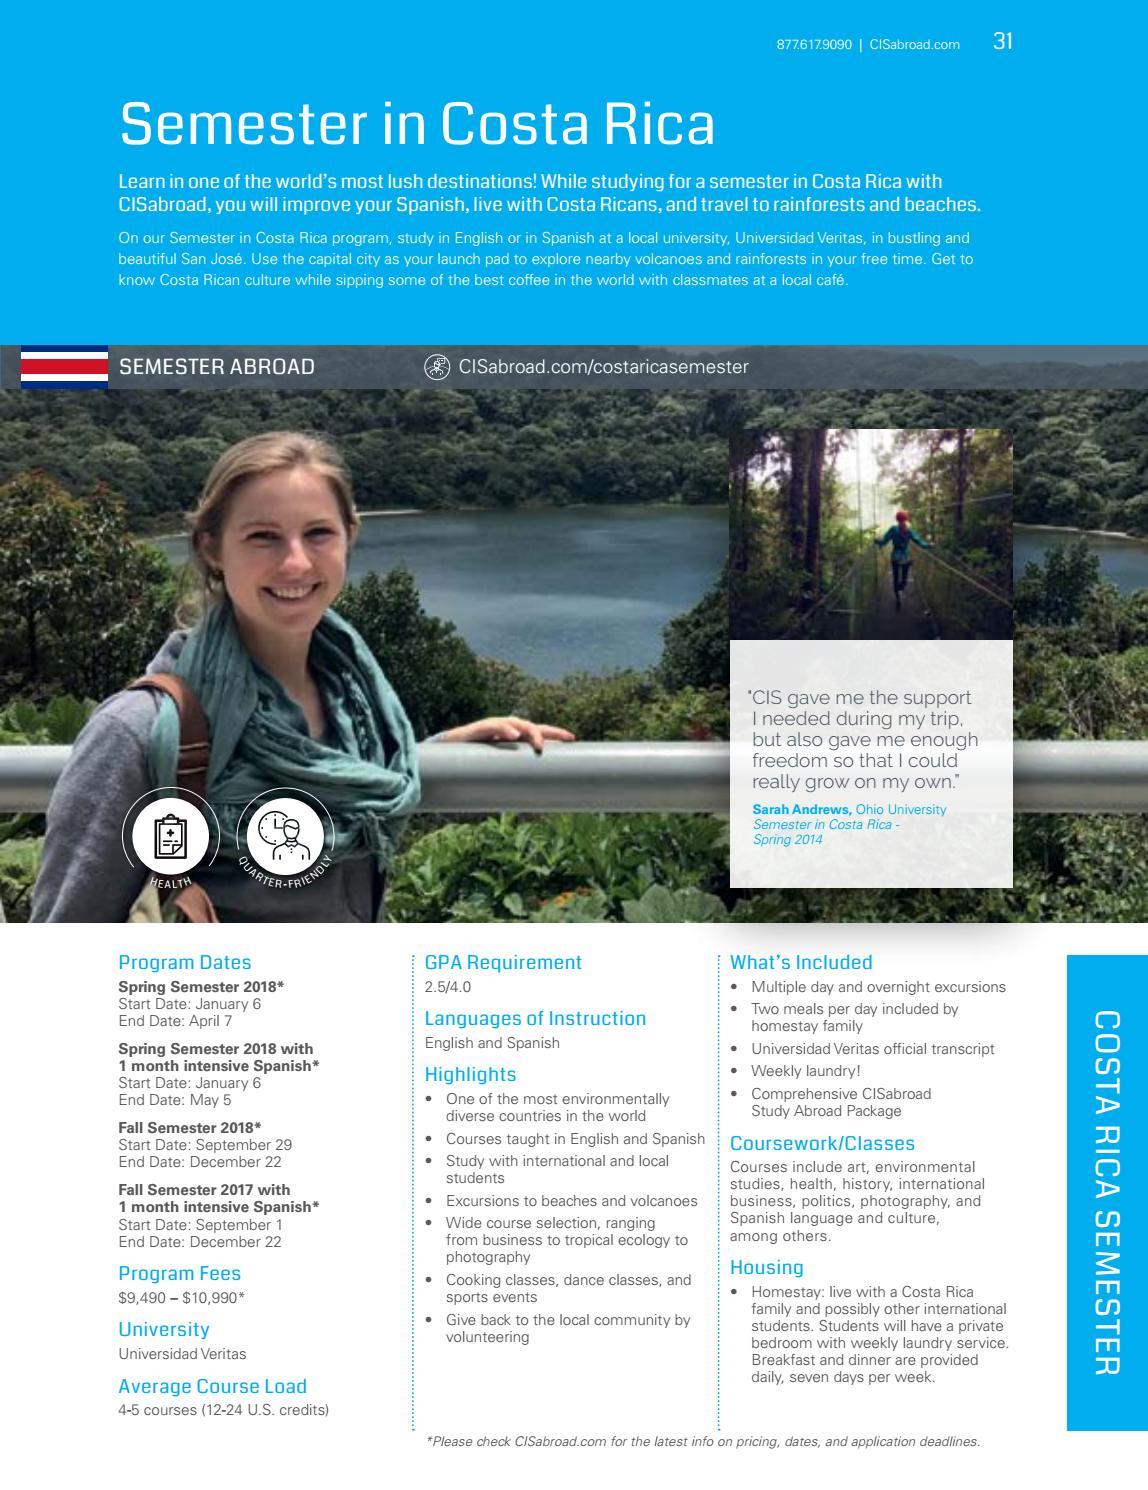 Dating service i Costa Rica